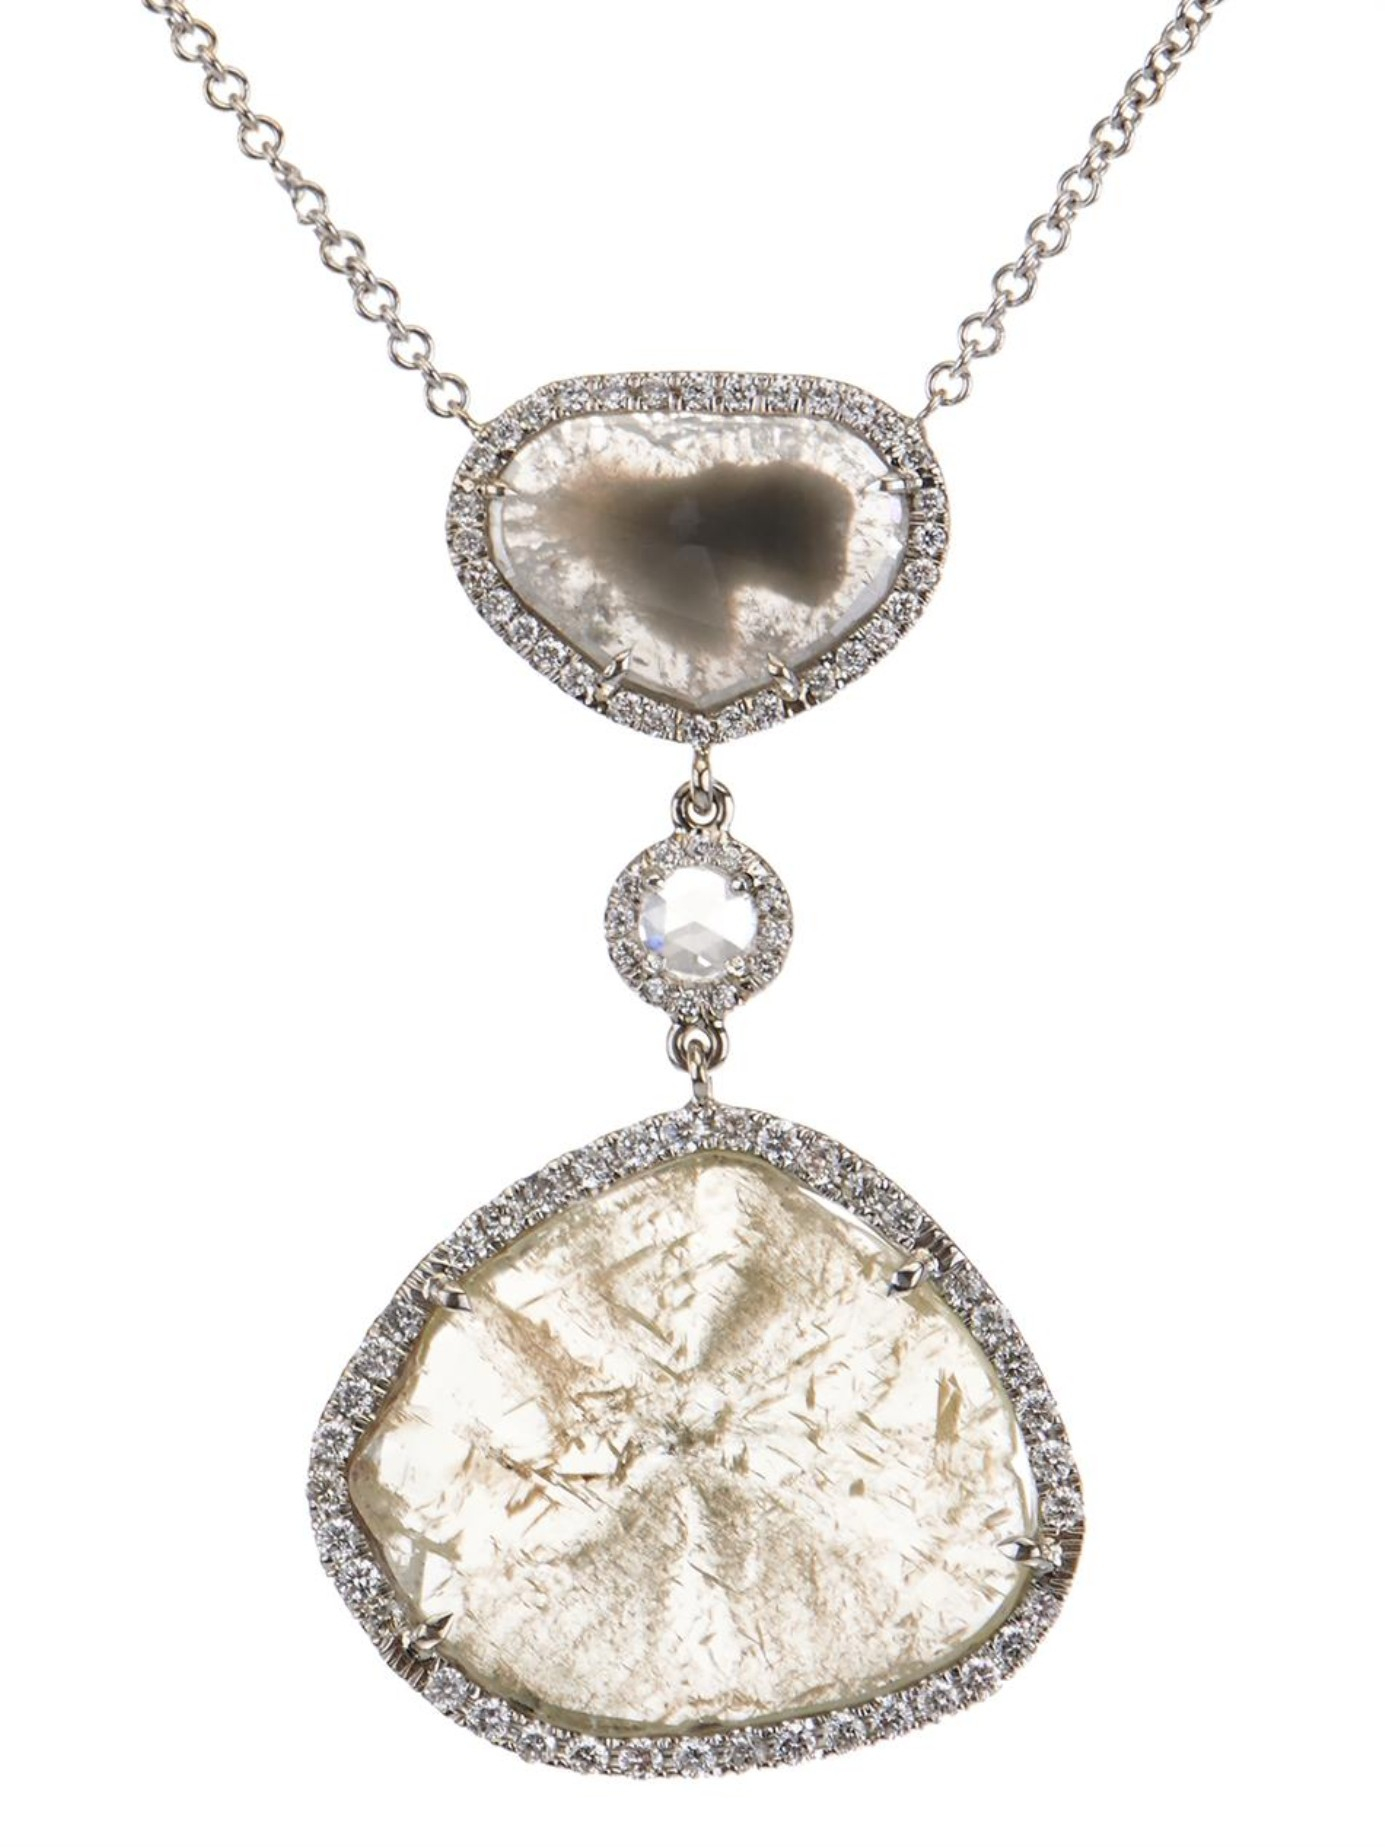 18kt gold, diamond & opal necklace Susan Foster